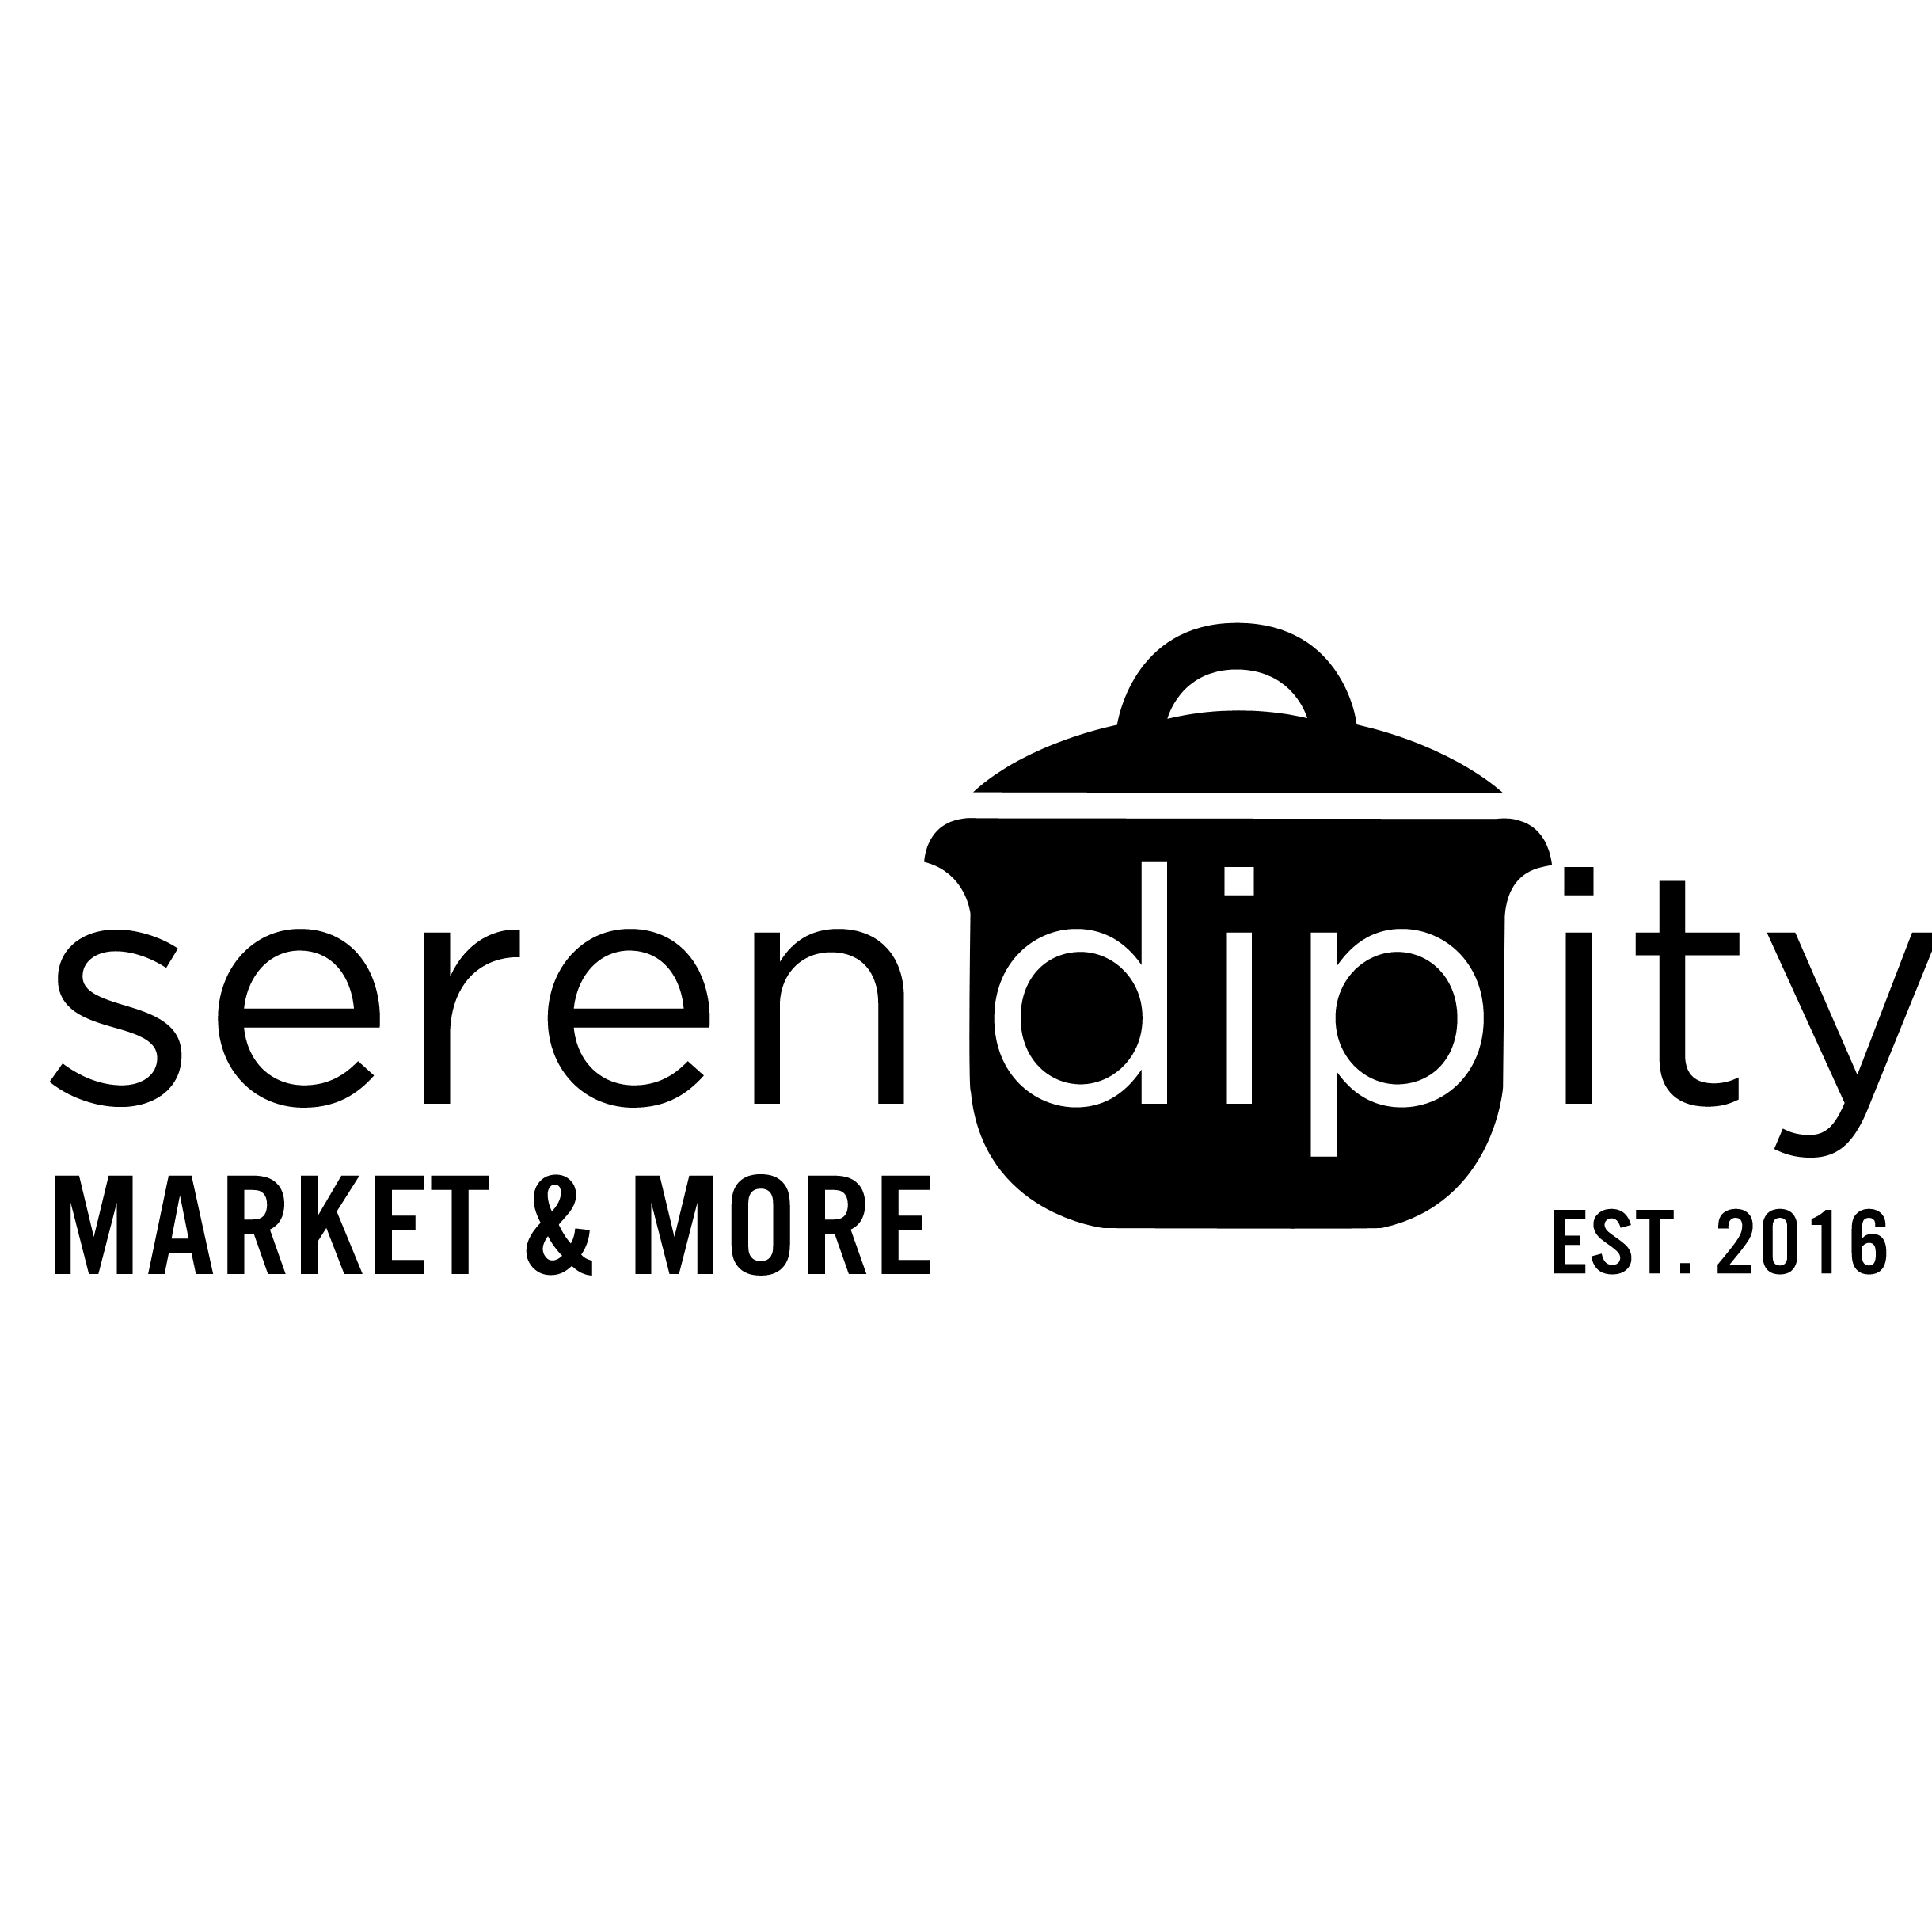 Serendipity Market & More